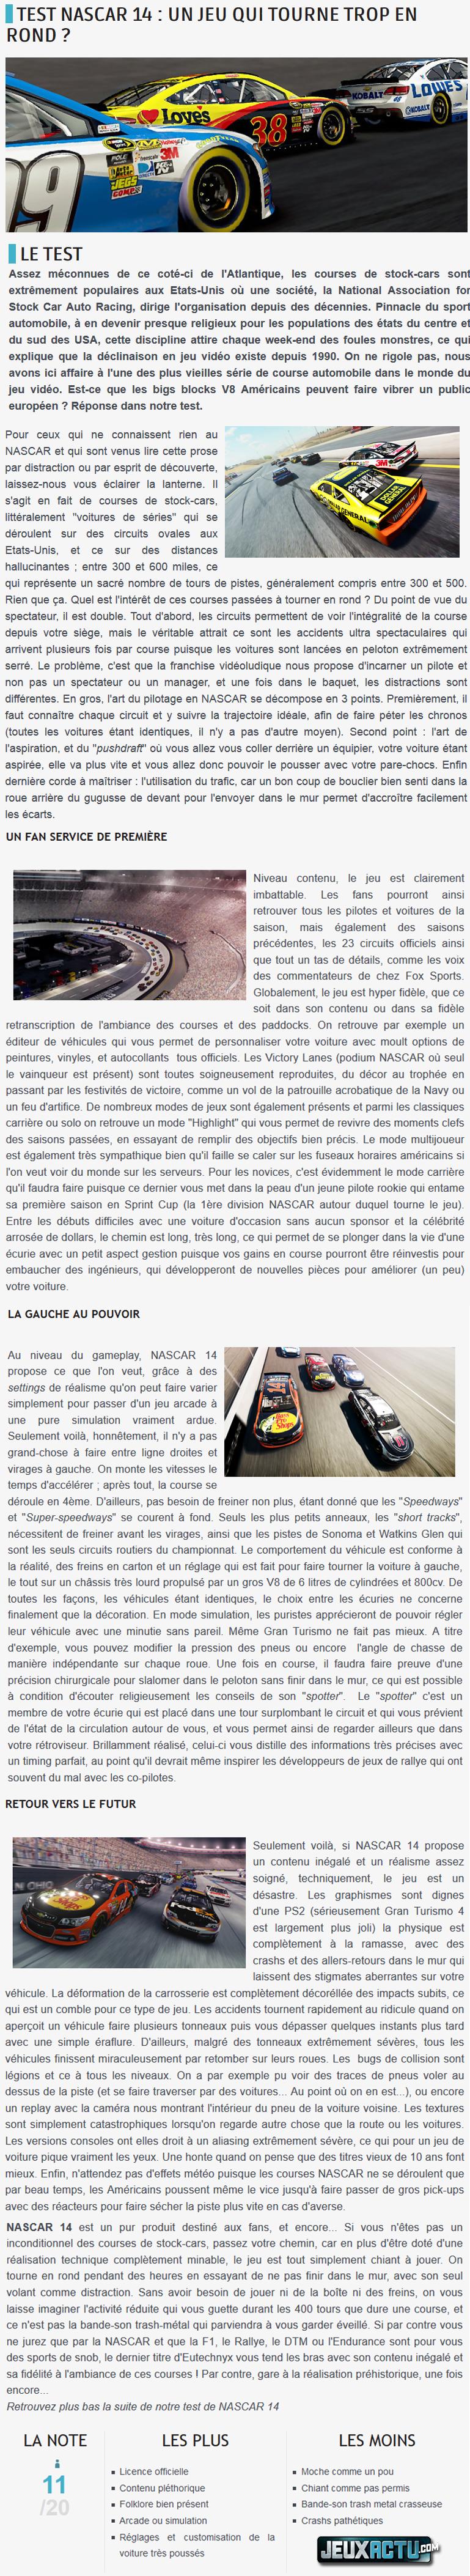 NASCAR 2014 - Page 2 543341testnascar11